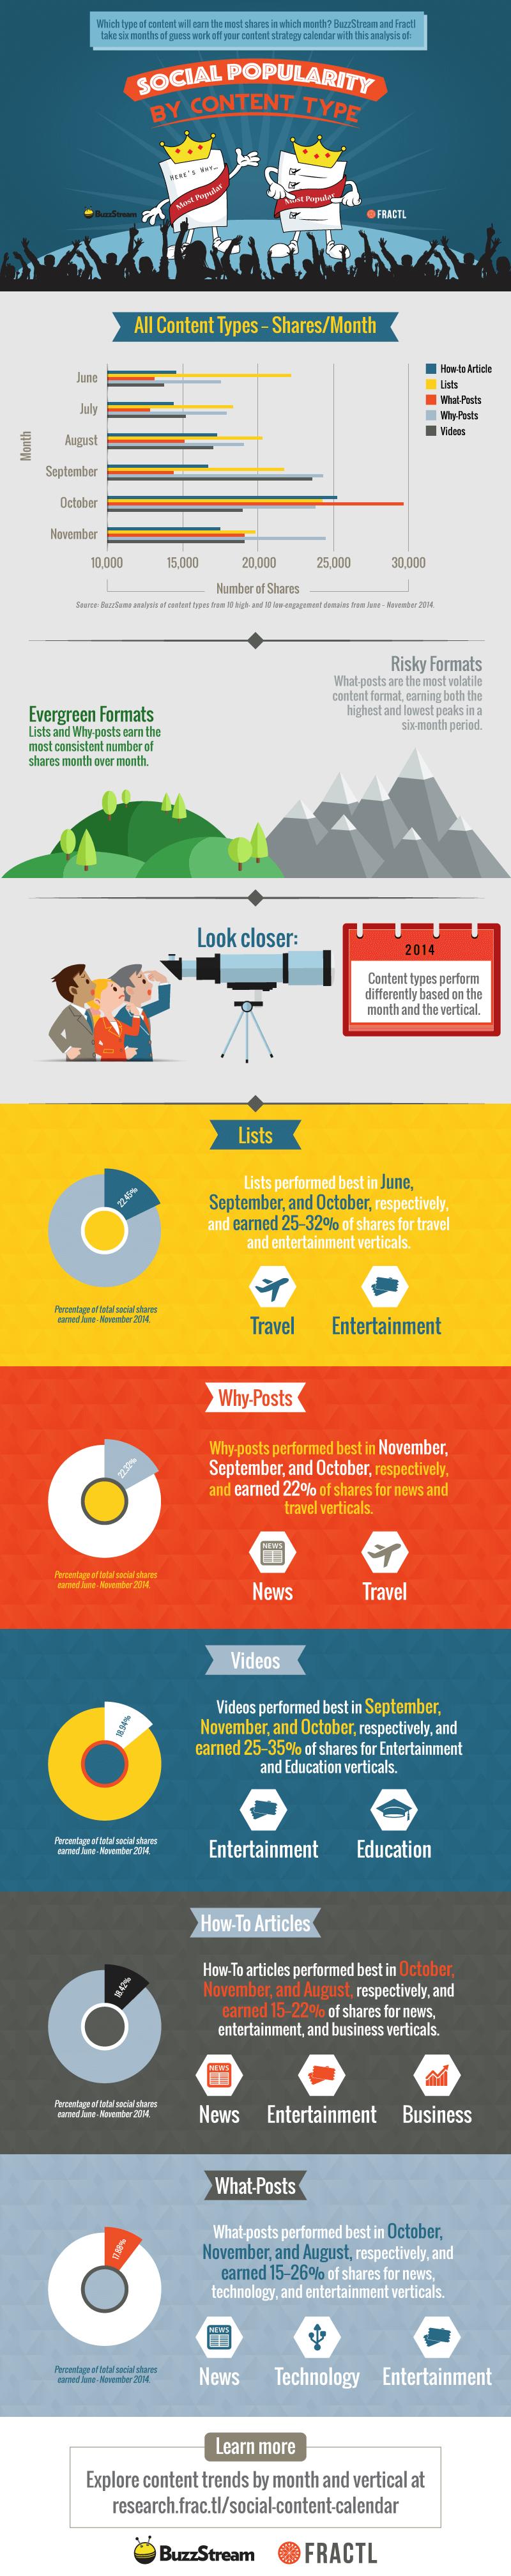 Infografik: Welcher Content funktioniert in den Social Medias?